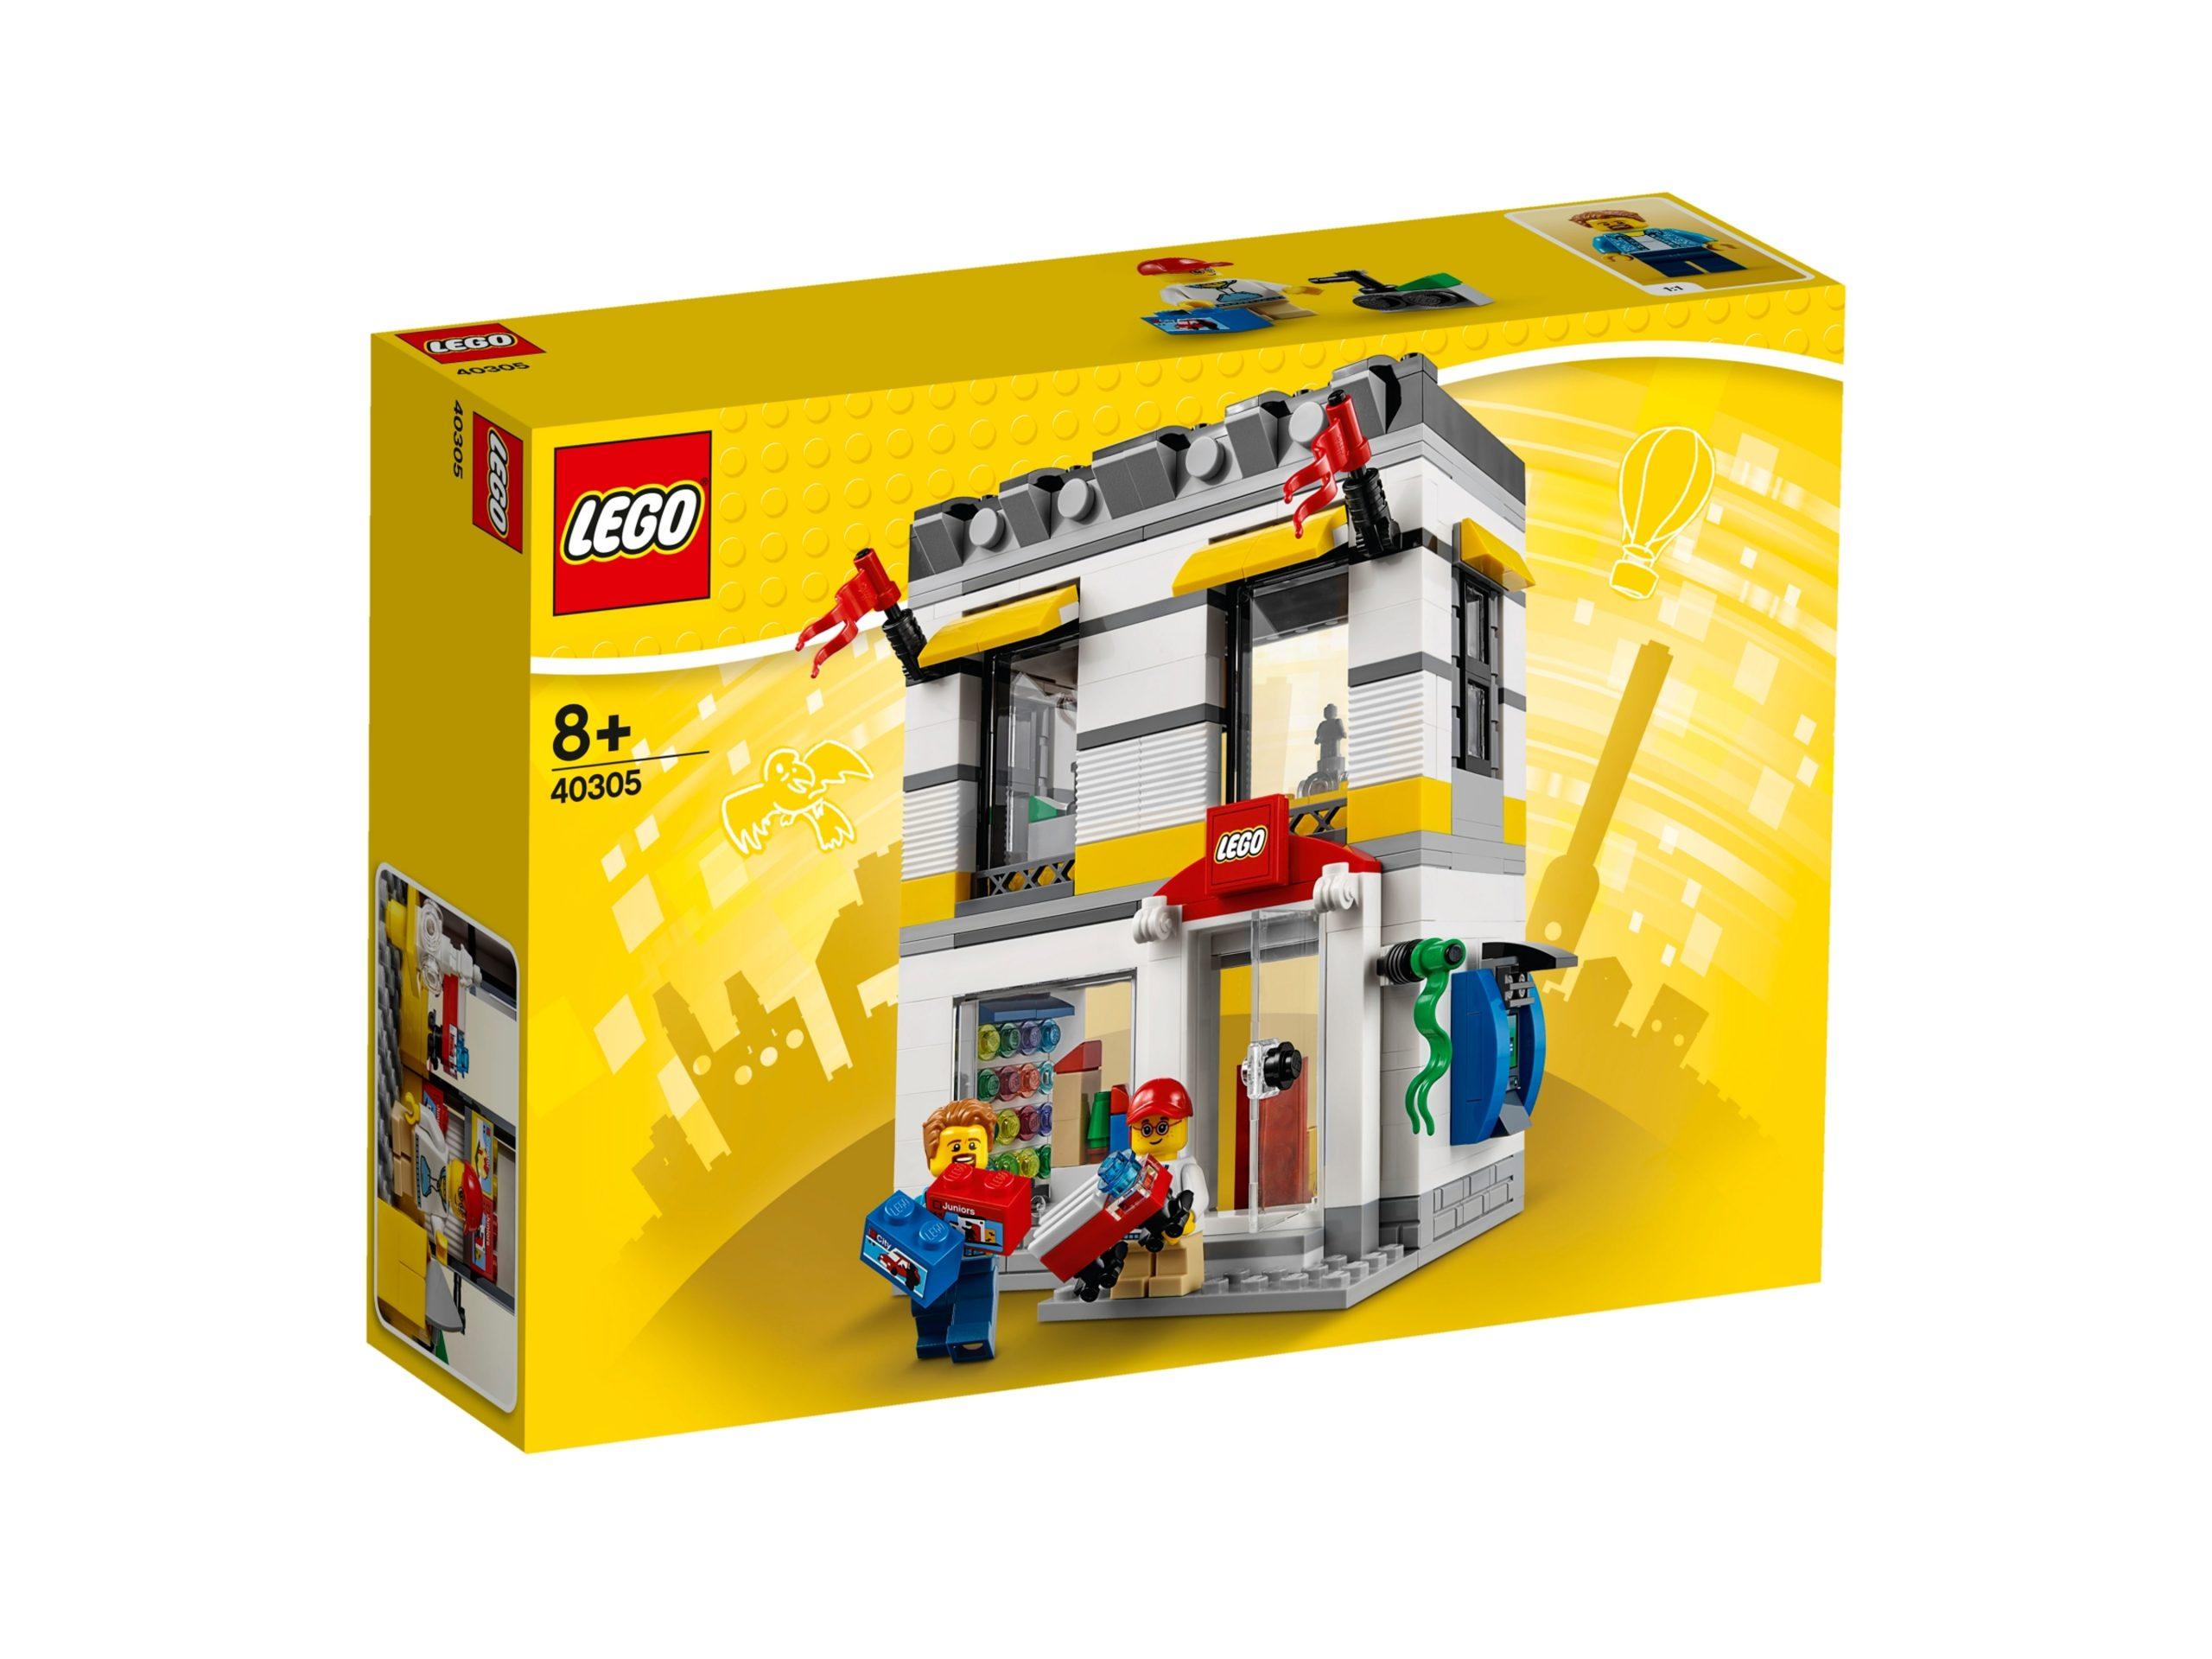 microscale lego 40305 brand store scaled